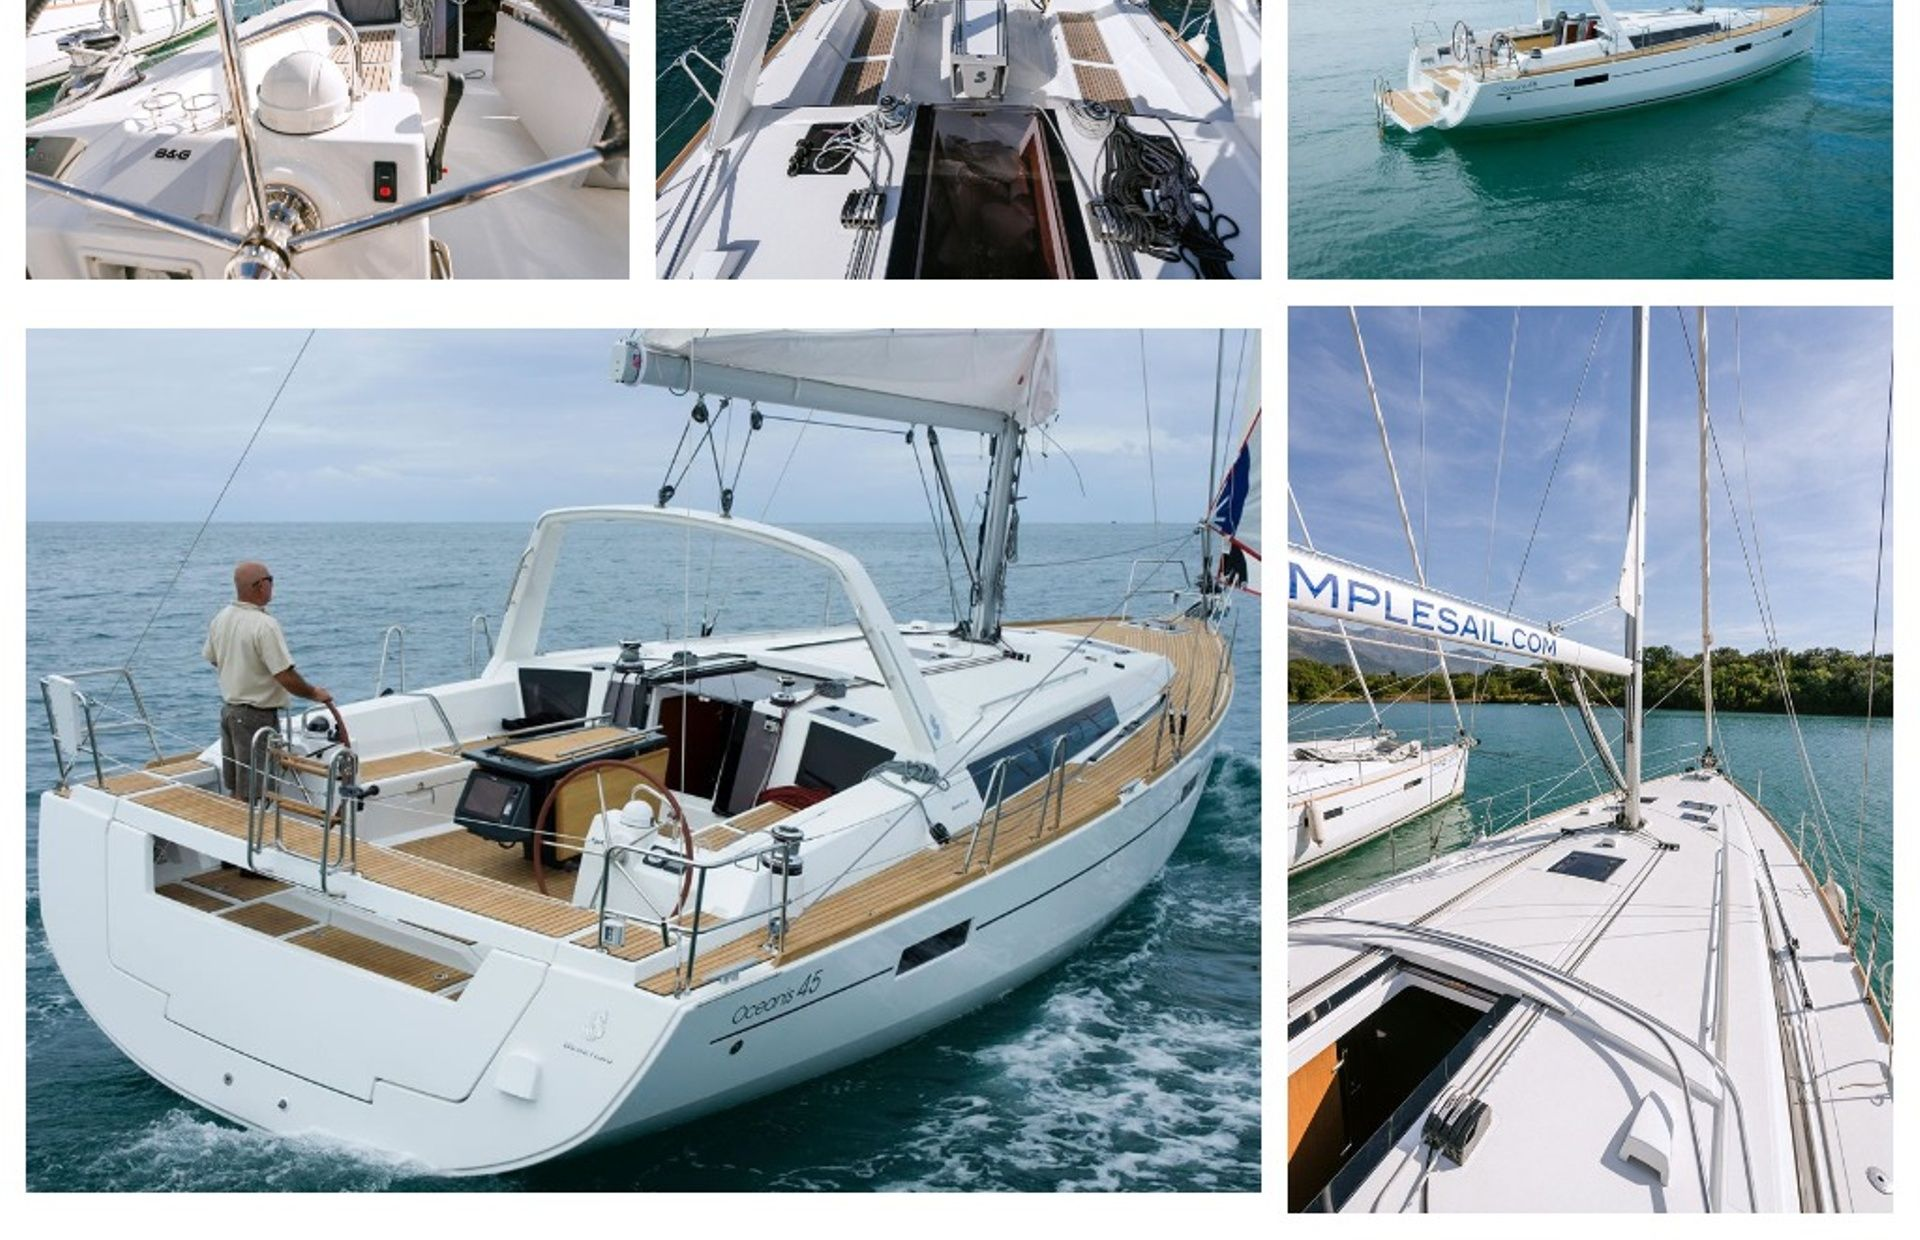 https://media.insailing.com/boat/beneteau/image_1563952352644.jpg